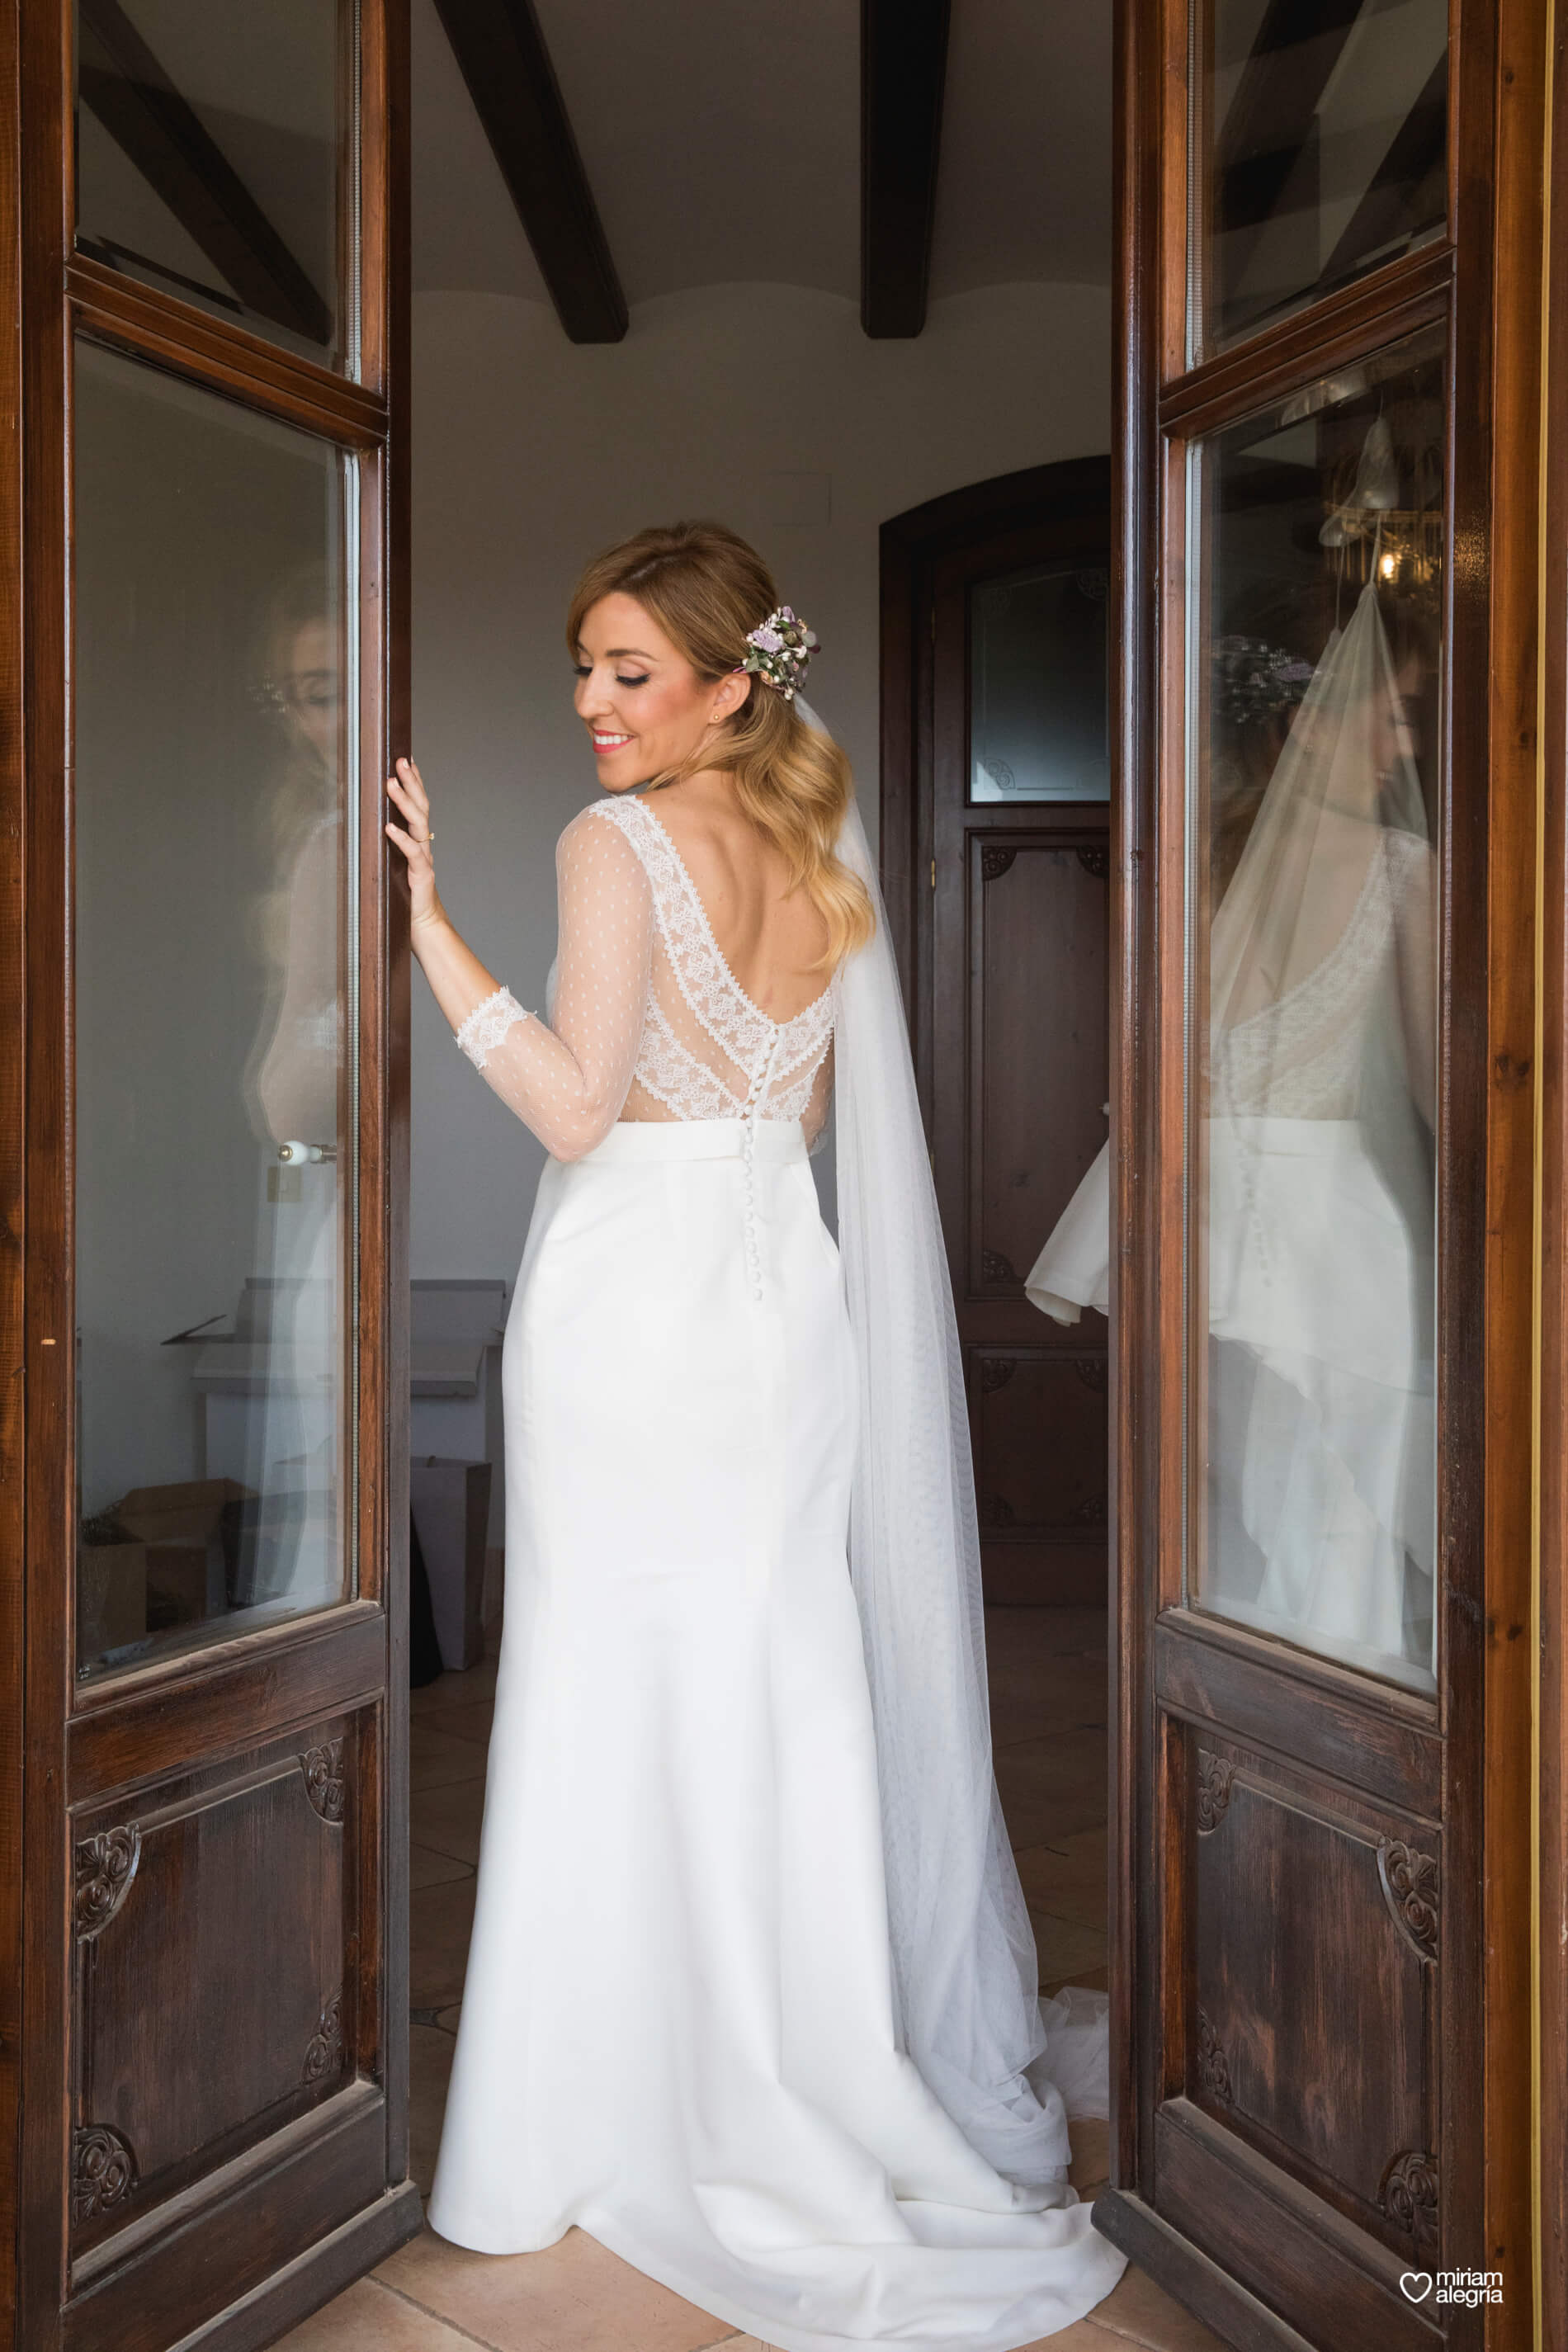 la-boda-de-alemc7-miriam-alegria-fotografos-boda-murcia-29